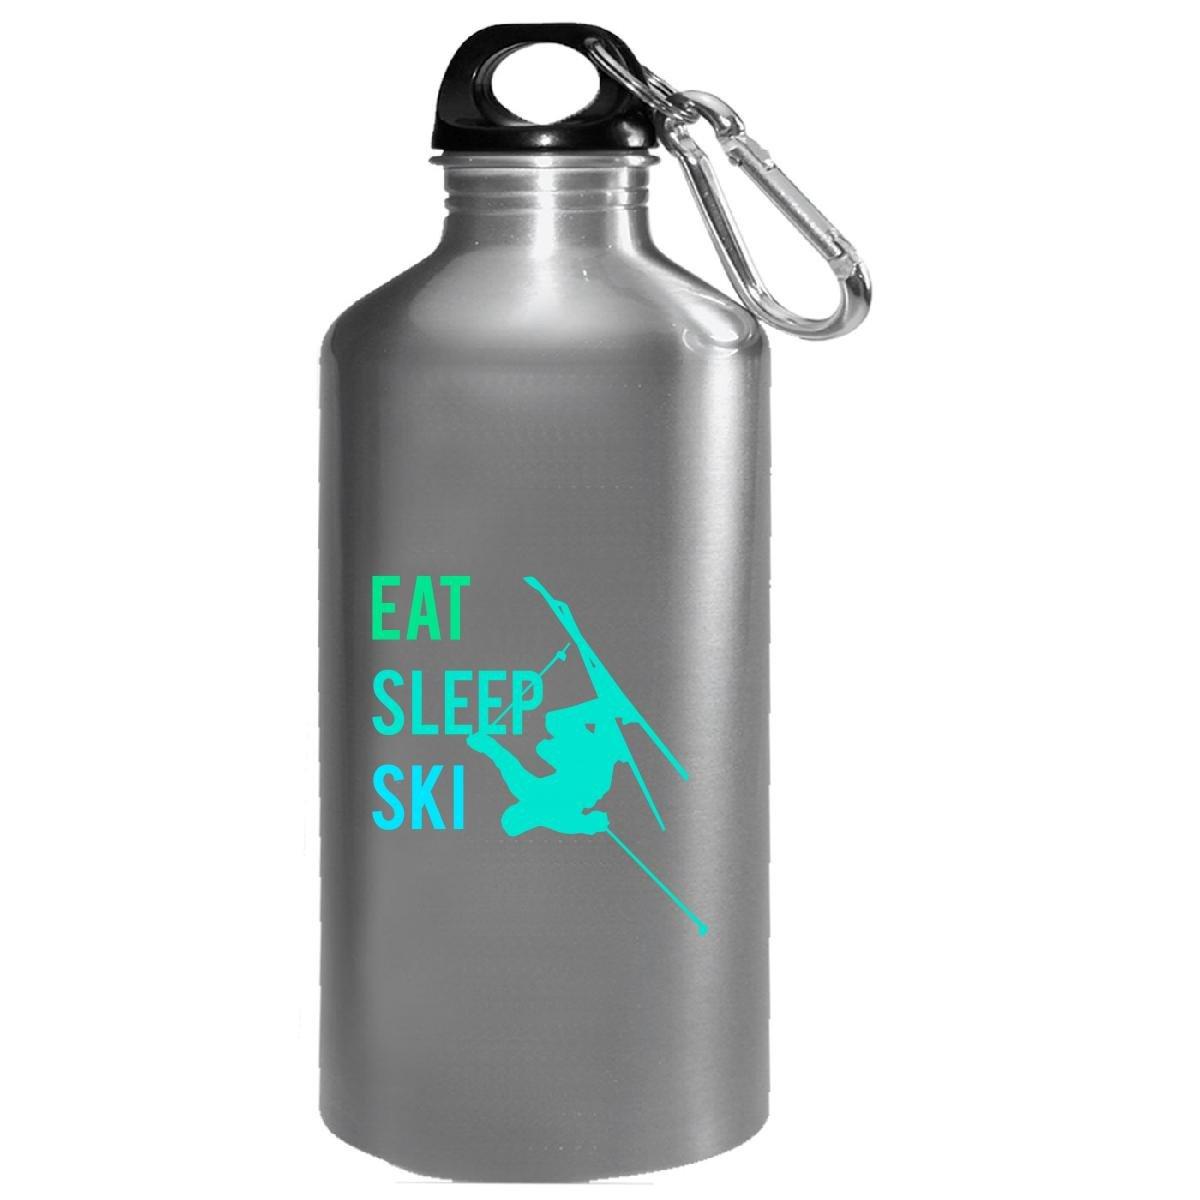 Eat Sleep Ski Extreme Sports Mountain Skiing Skier Winter - Water Bottle by VONC